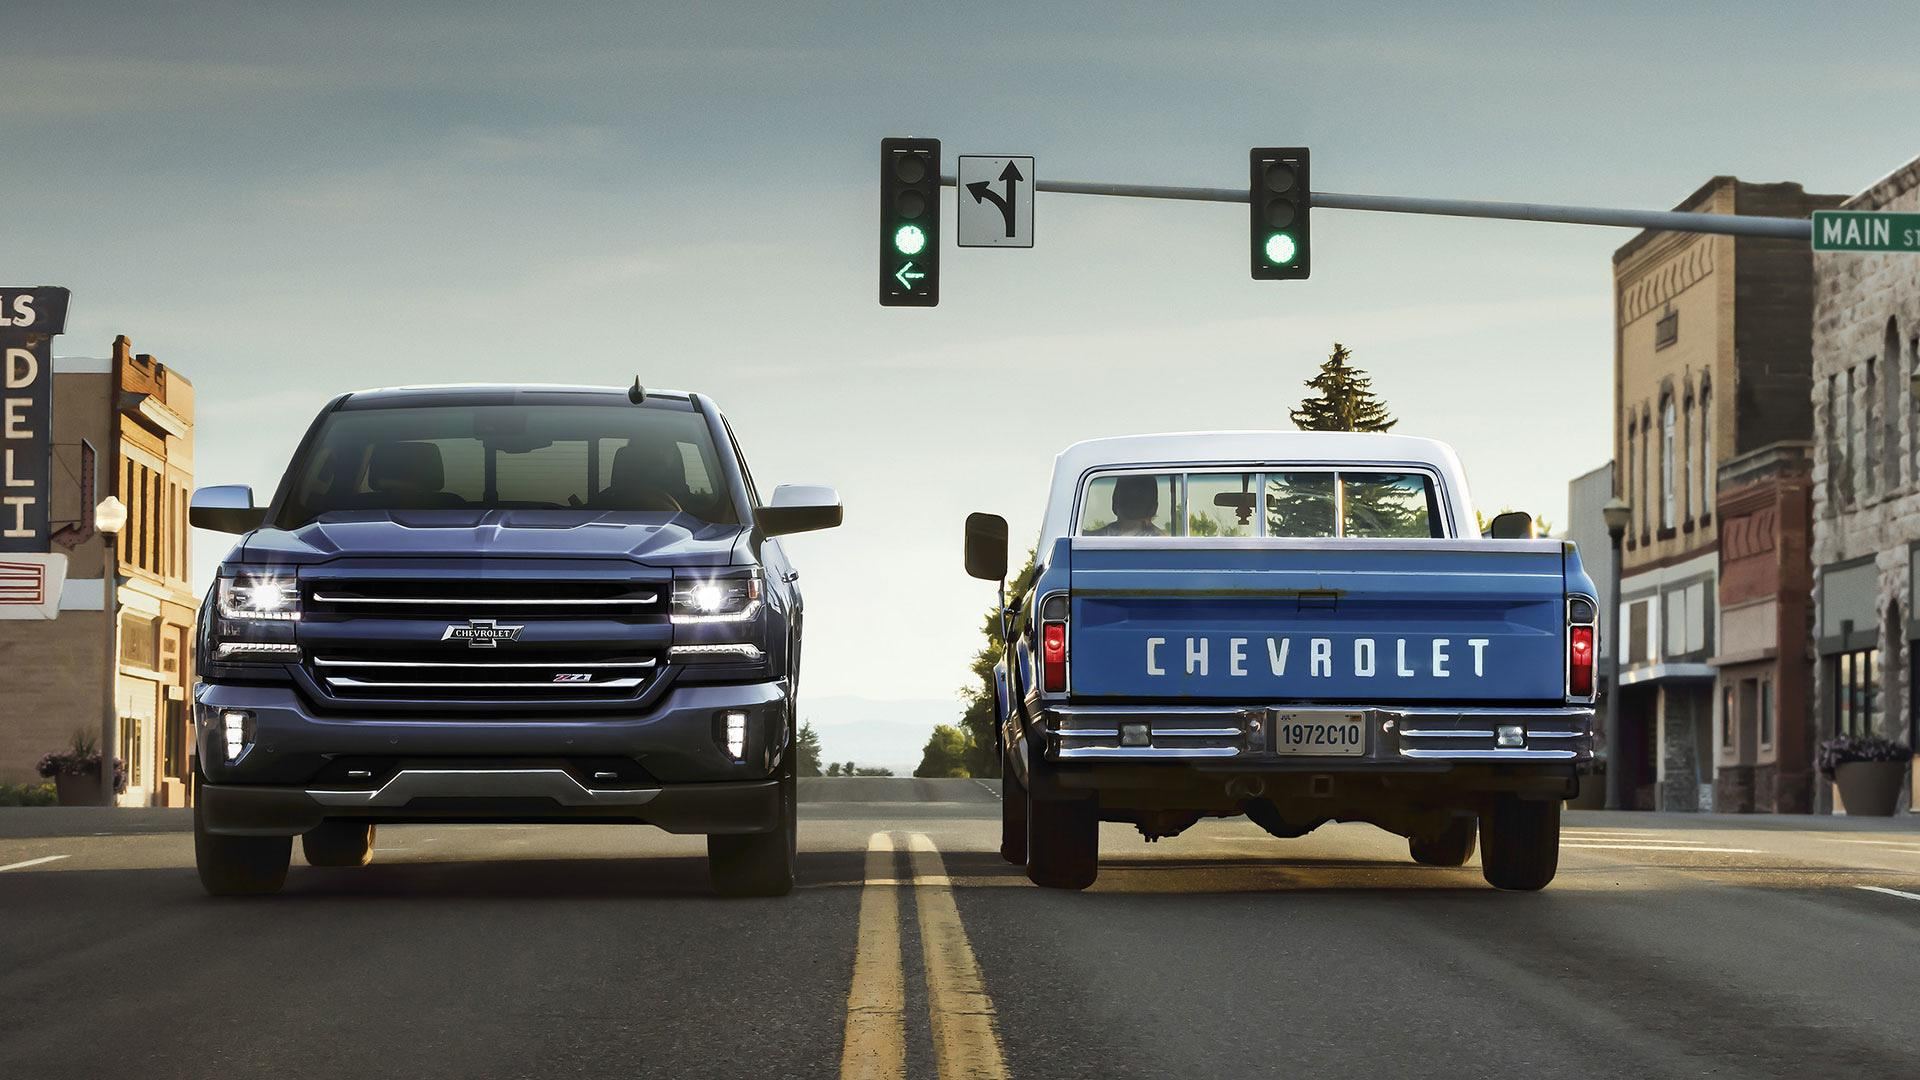 Chevy Colorado Centennial Edition >> VWVortex.com - 2018 Chevrolet Colorado & Silverado Centennial Editions celebrate 100 years of ...